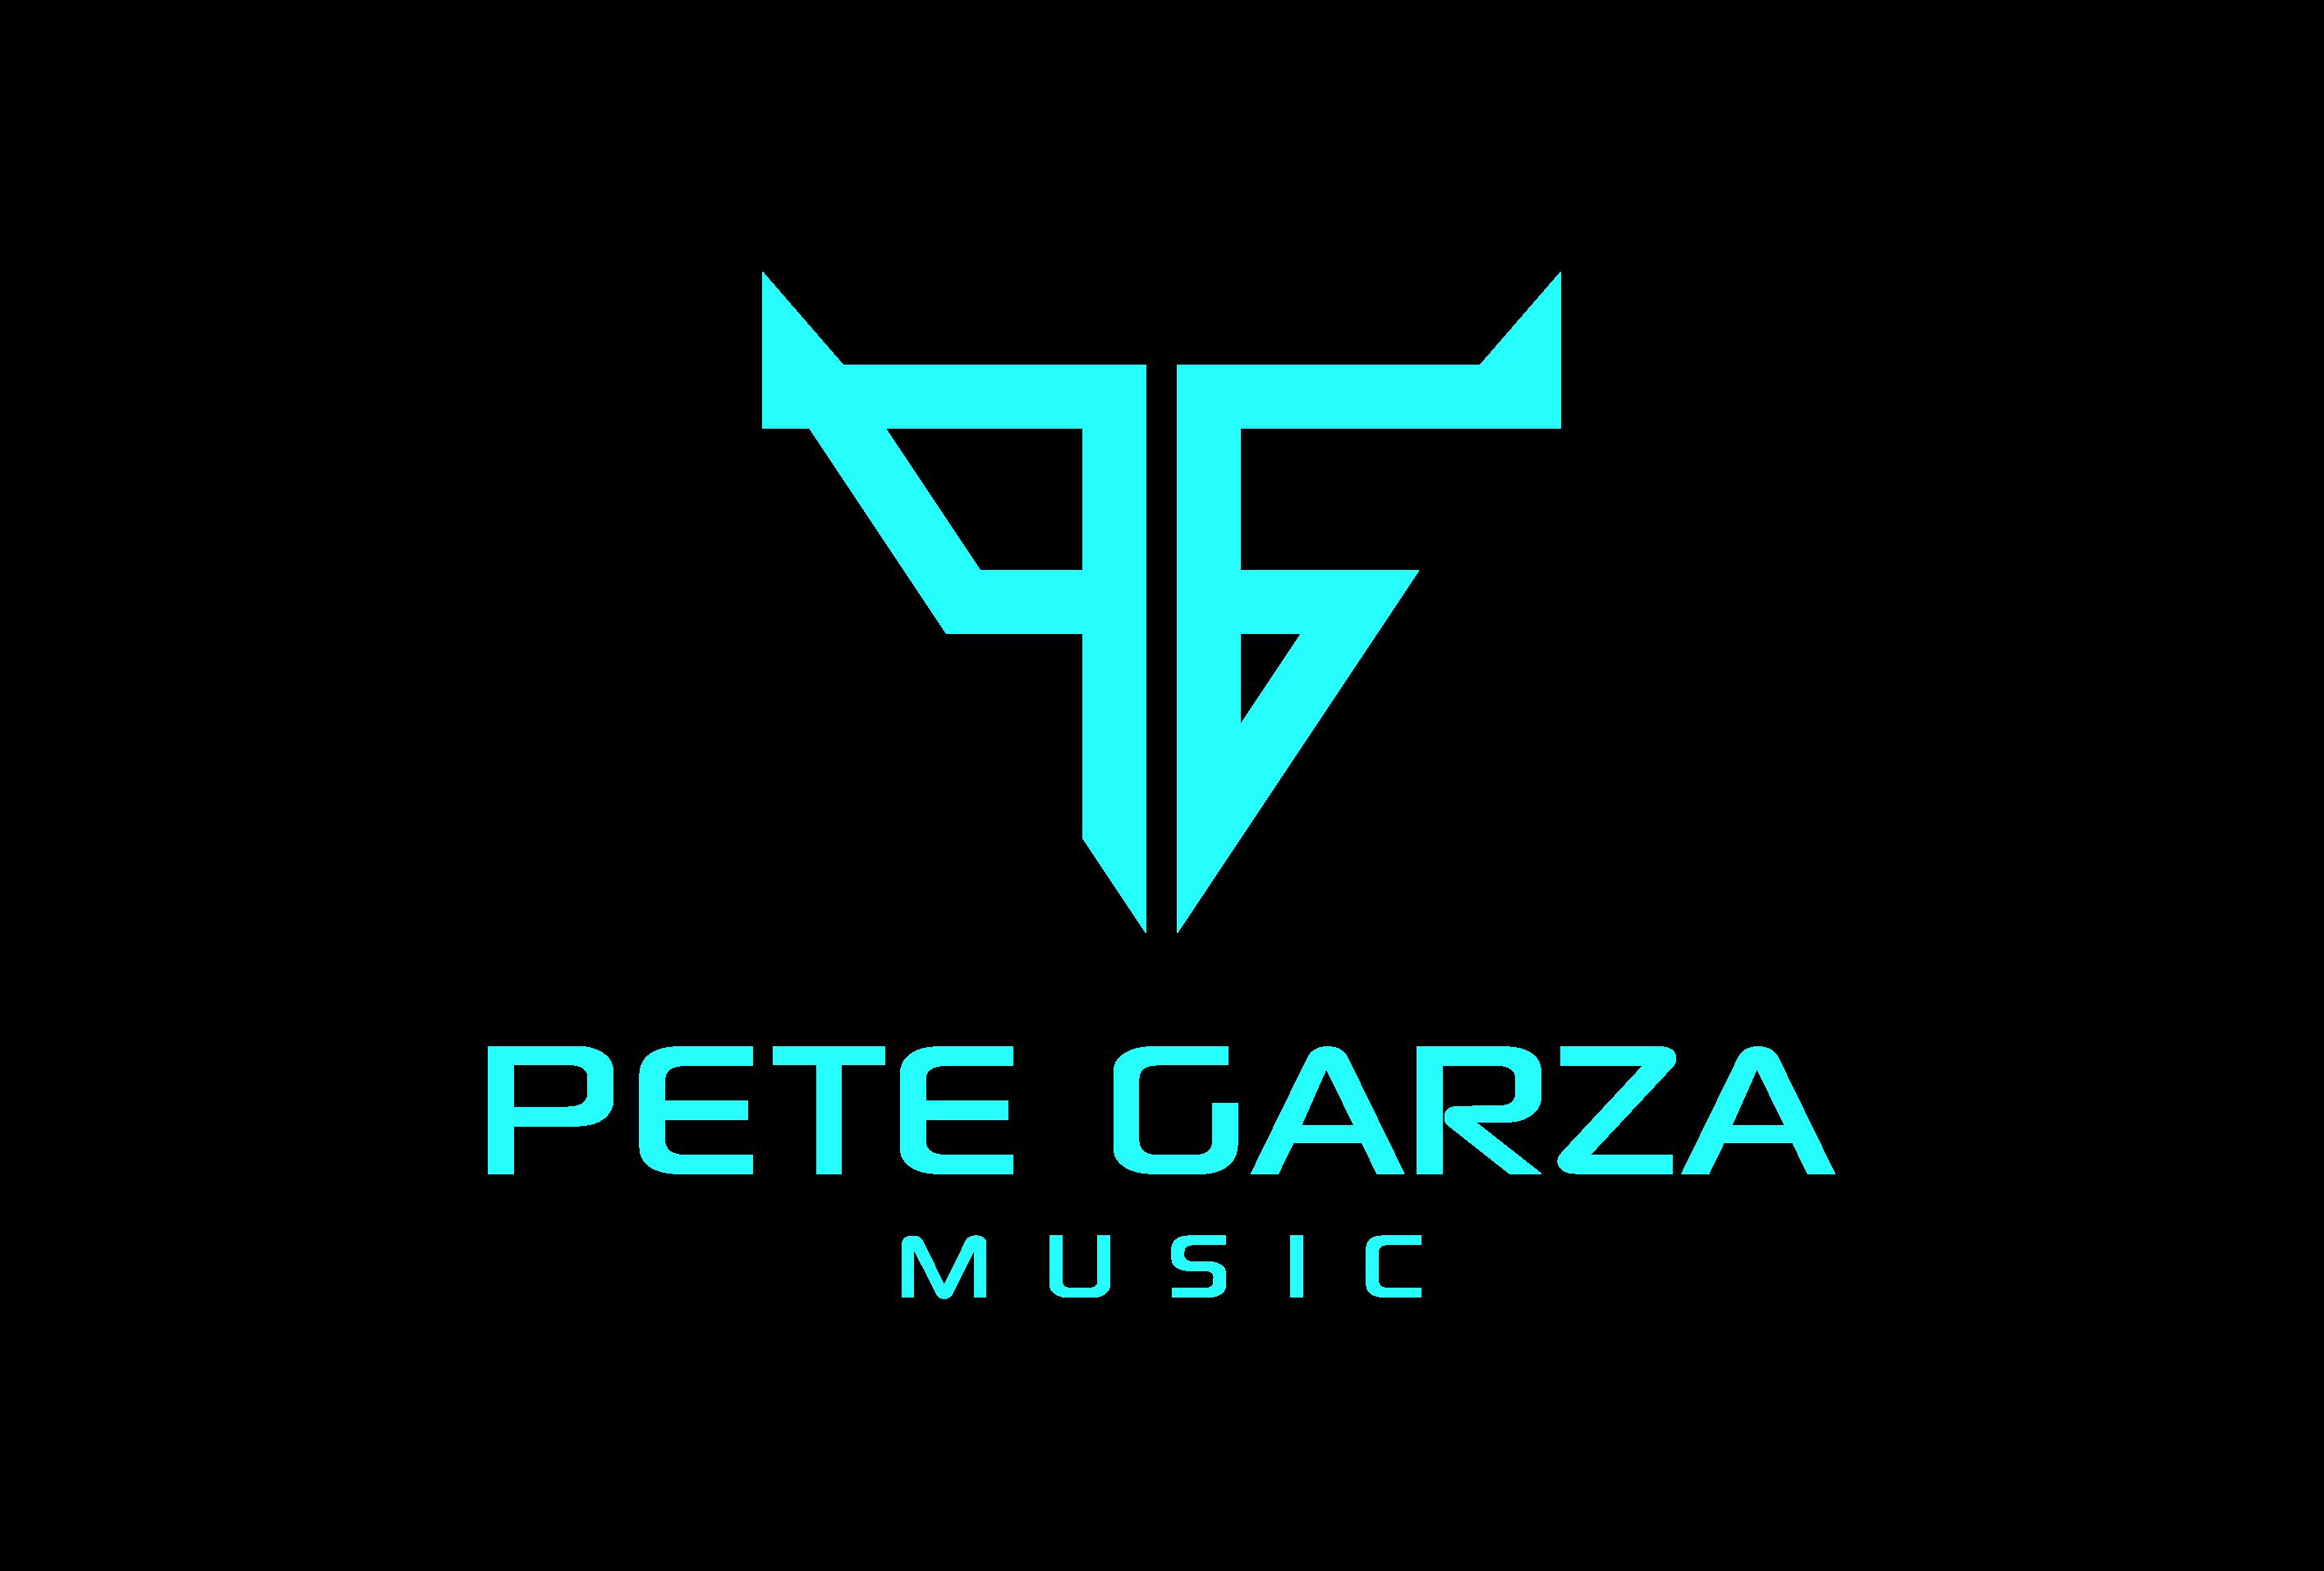 Pete Garza Music